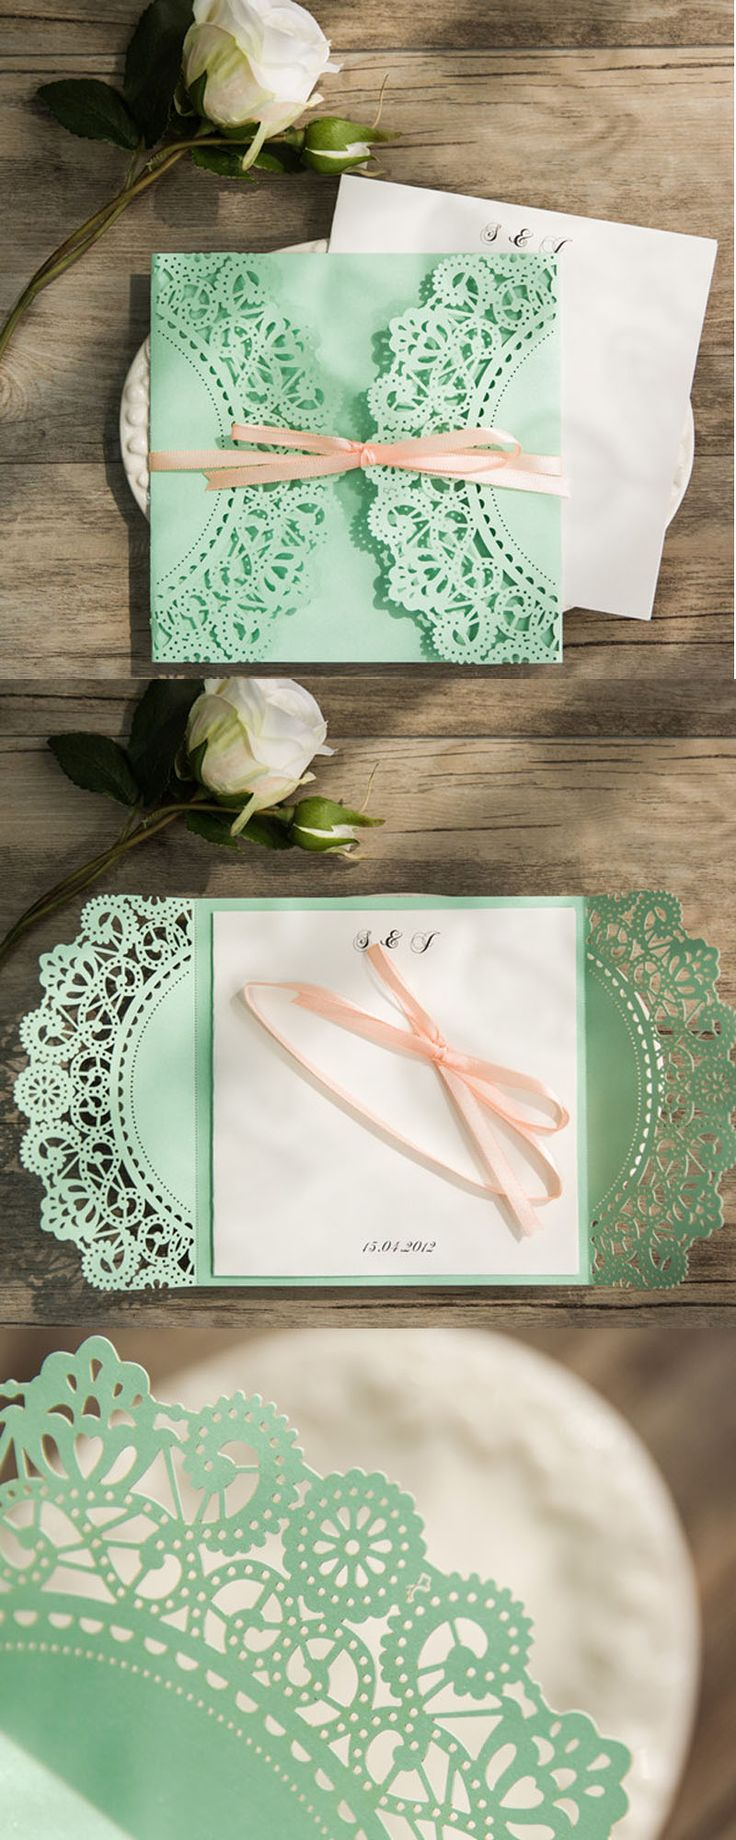 125 best images about laser cut wedding invitations on for Laser cut wedding invitations minted